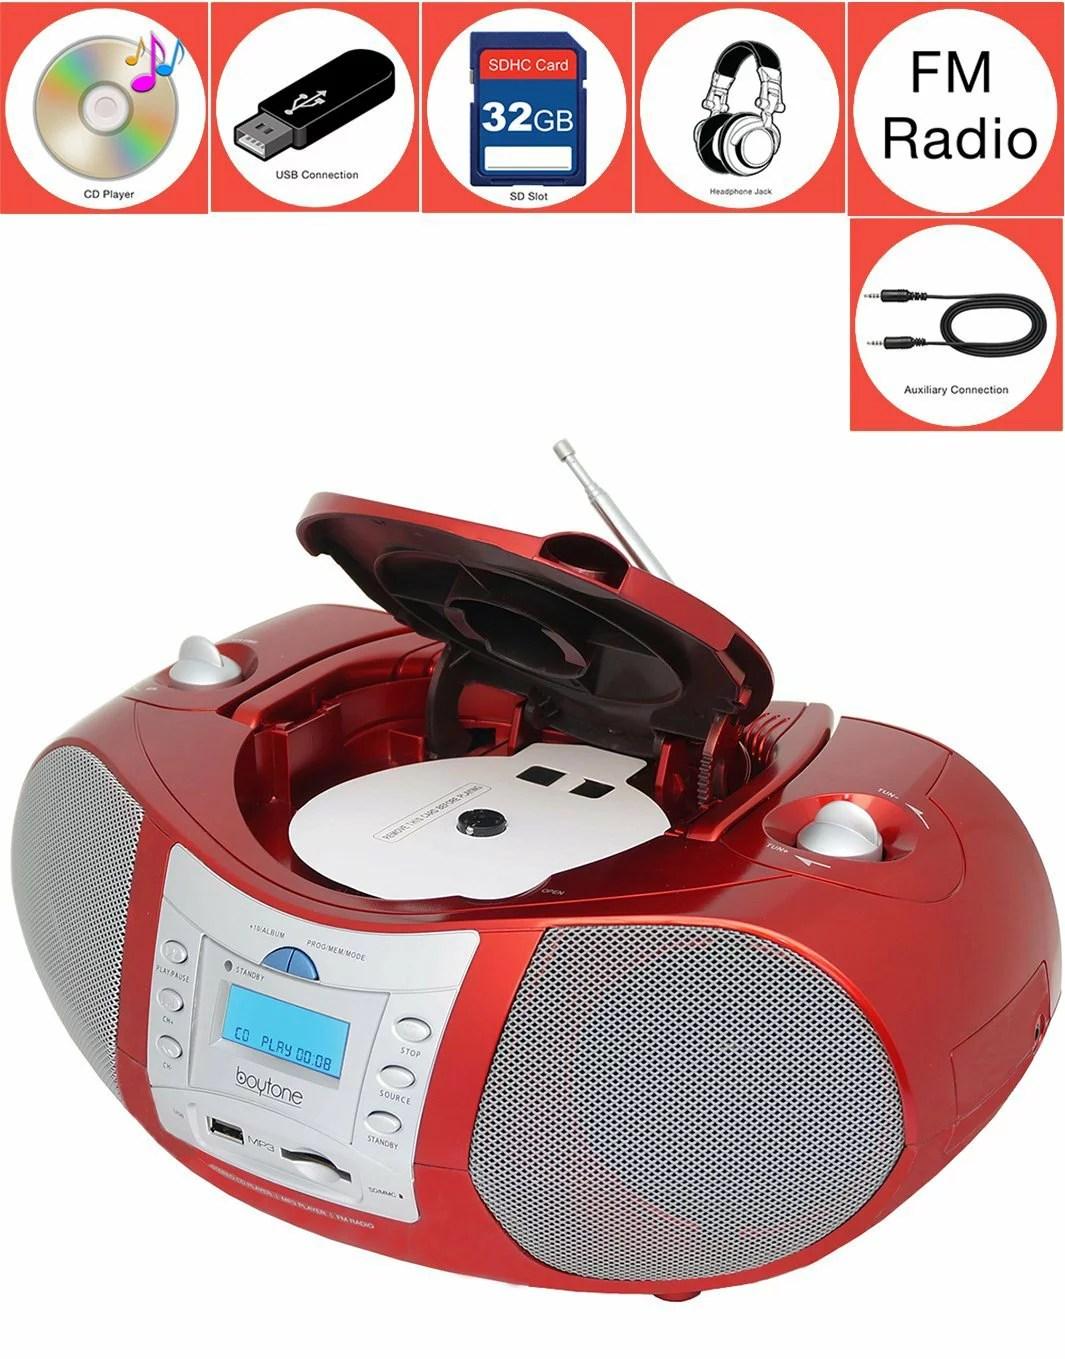 hight resolution of boytone bt 6r boombox cd player usb sd mmc slot fm radio auxiliary